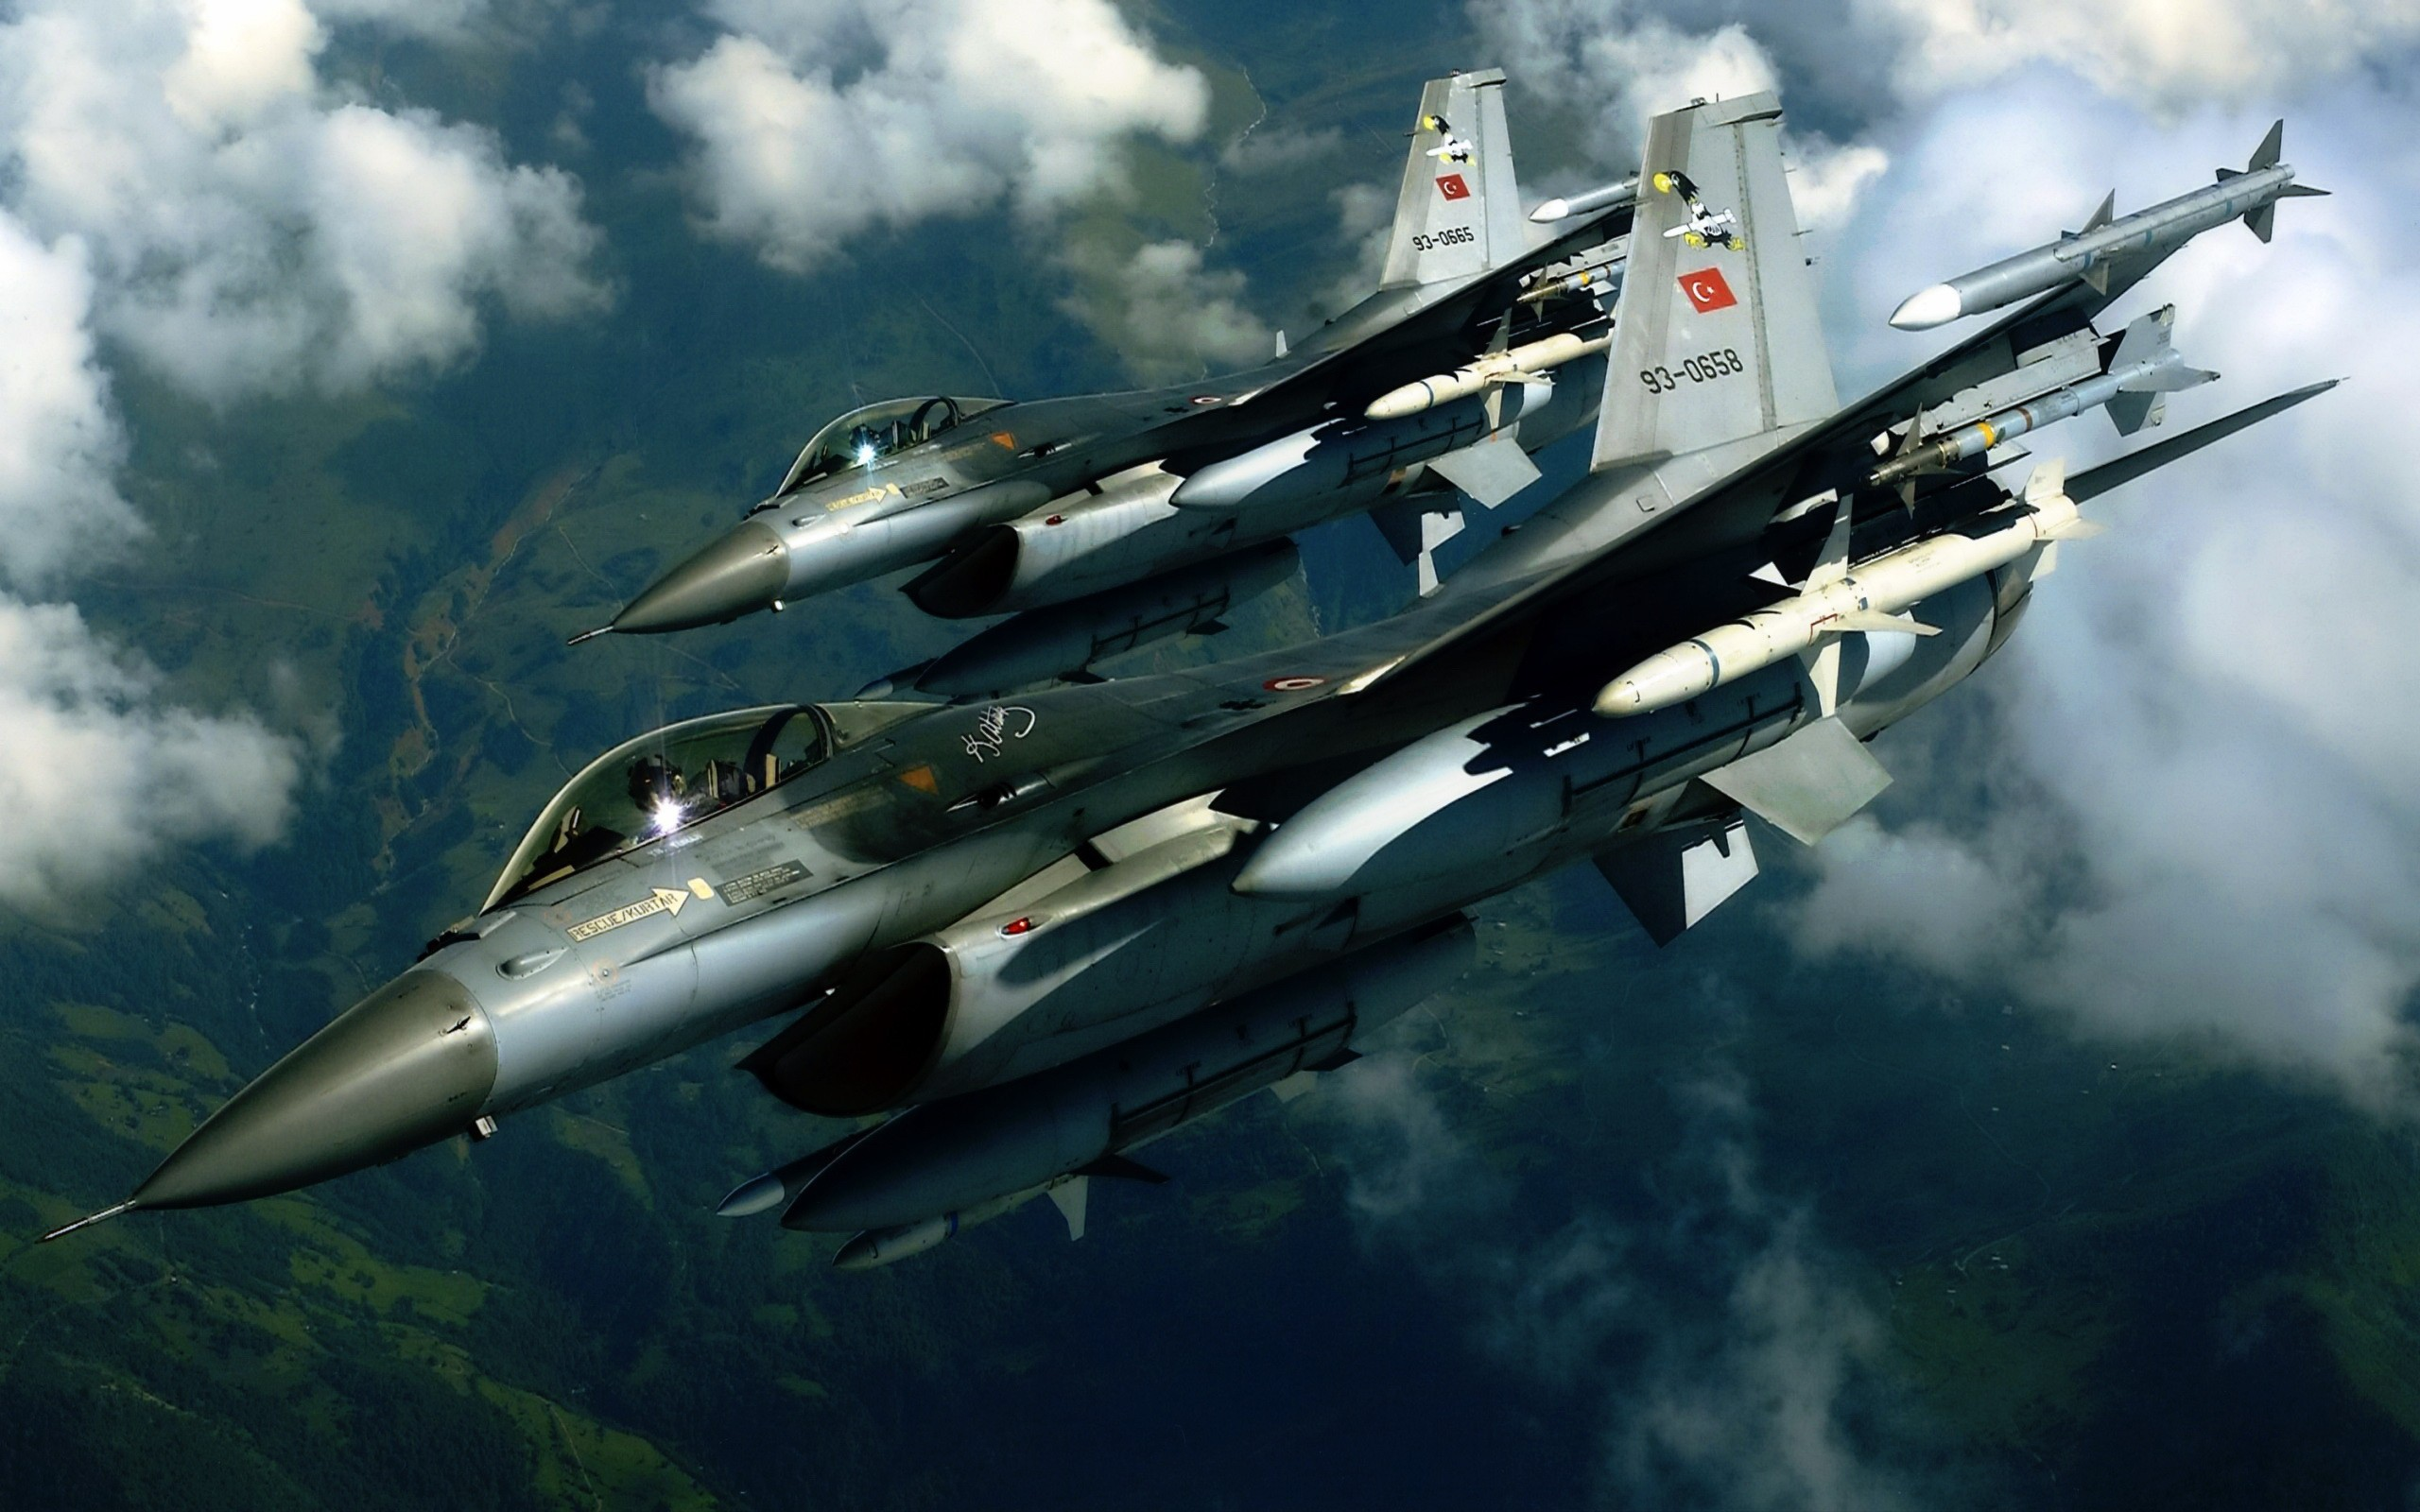 F 16 Fighting Falcon Aircraft Wallpaper HD Download